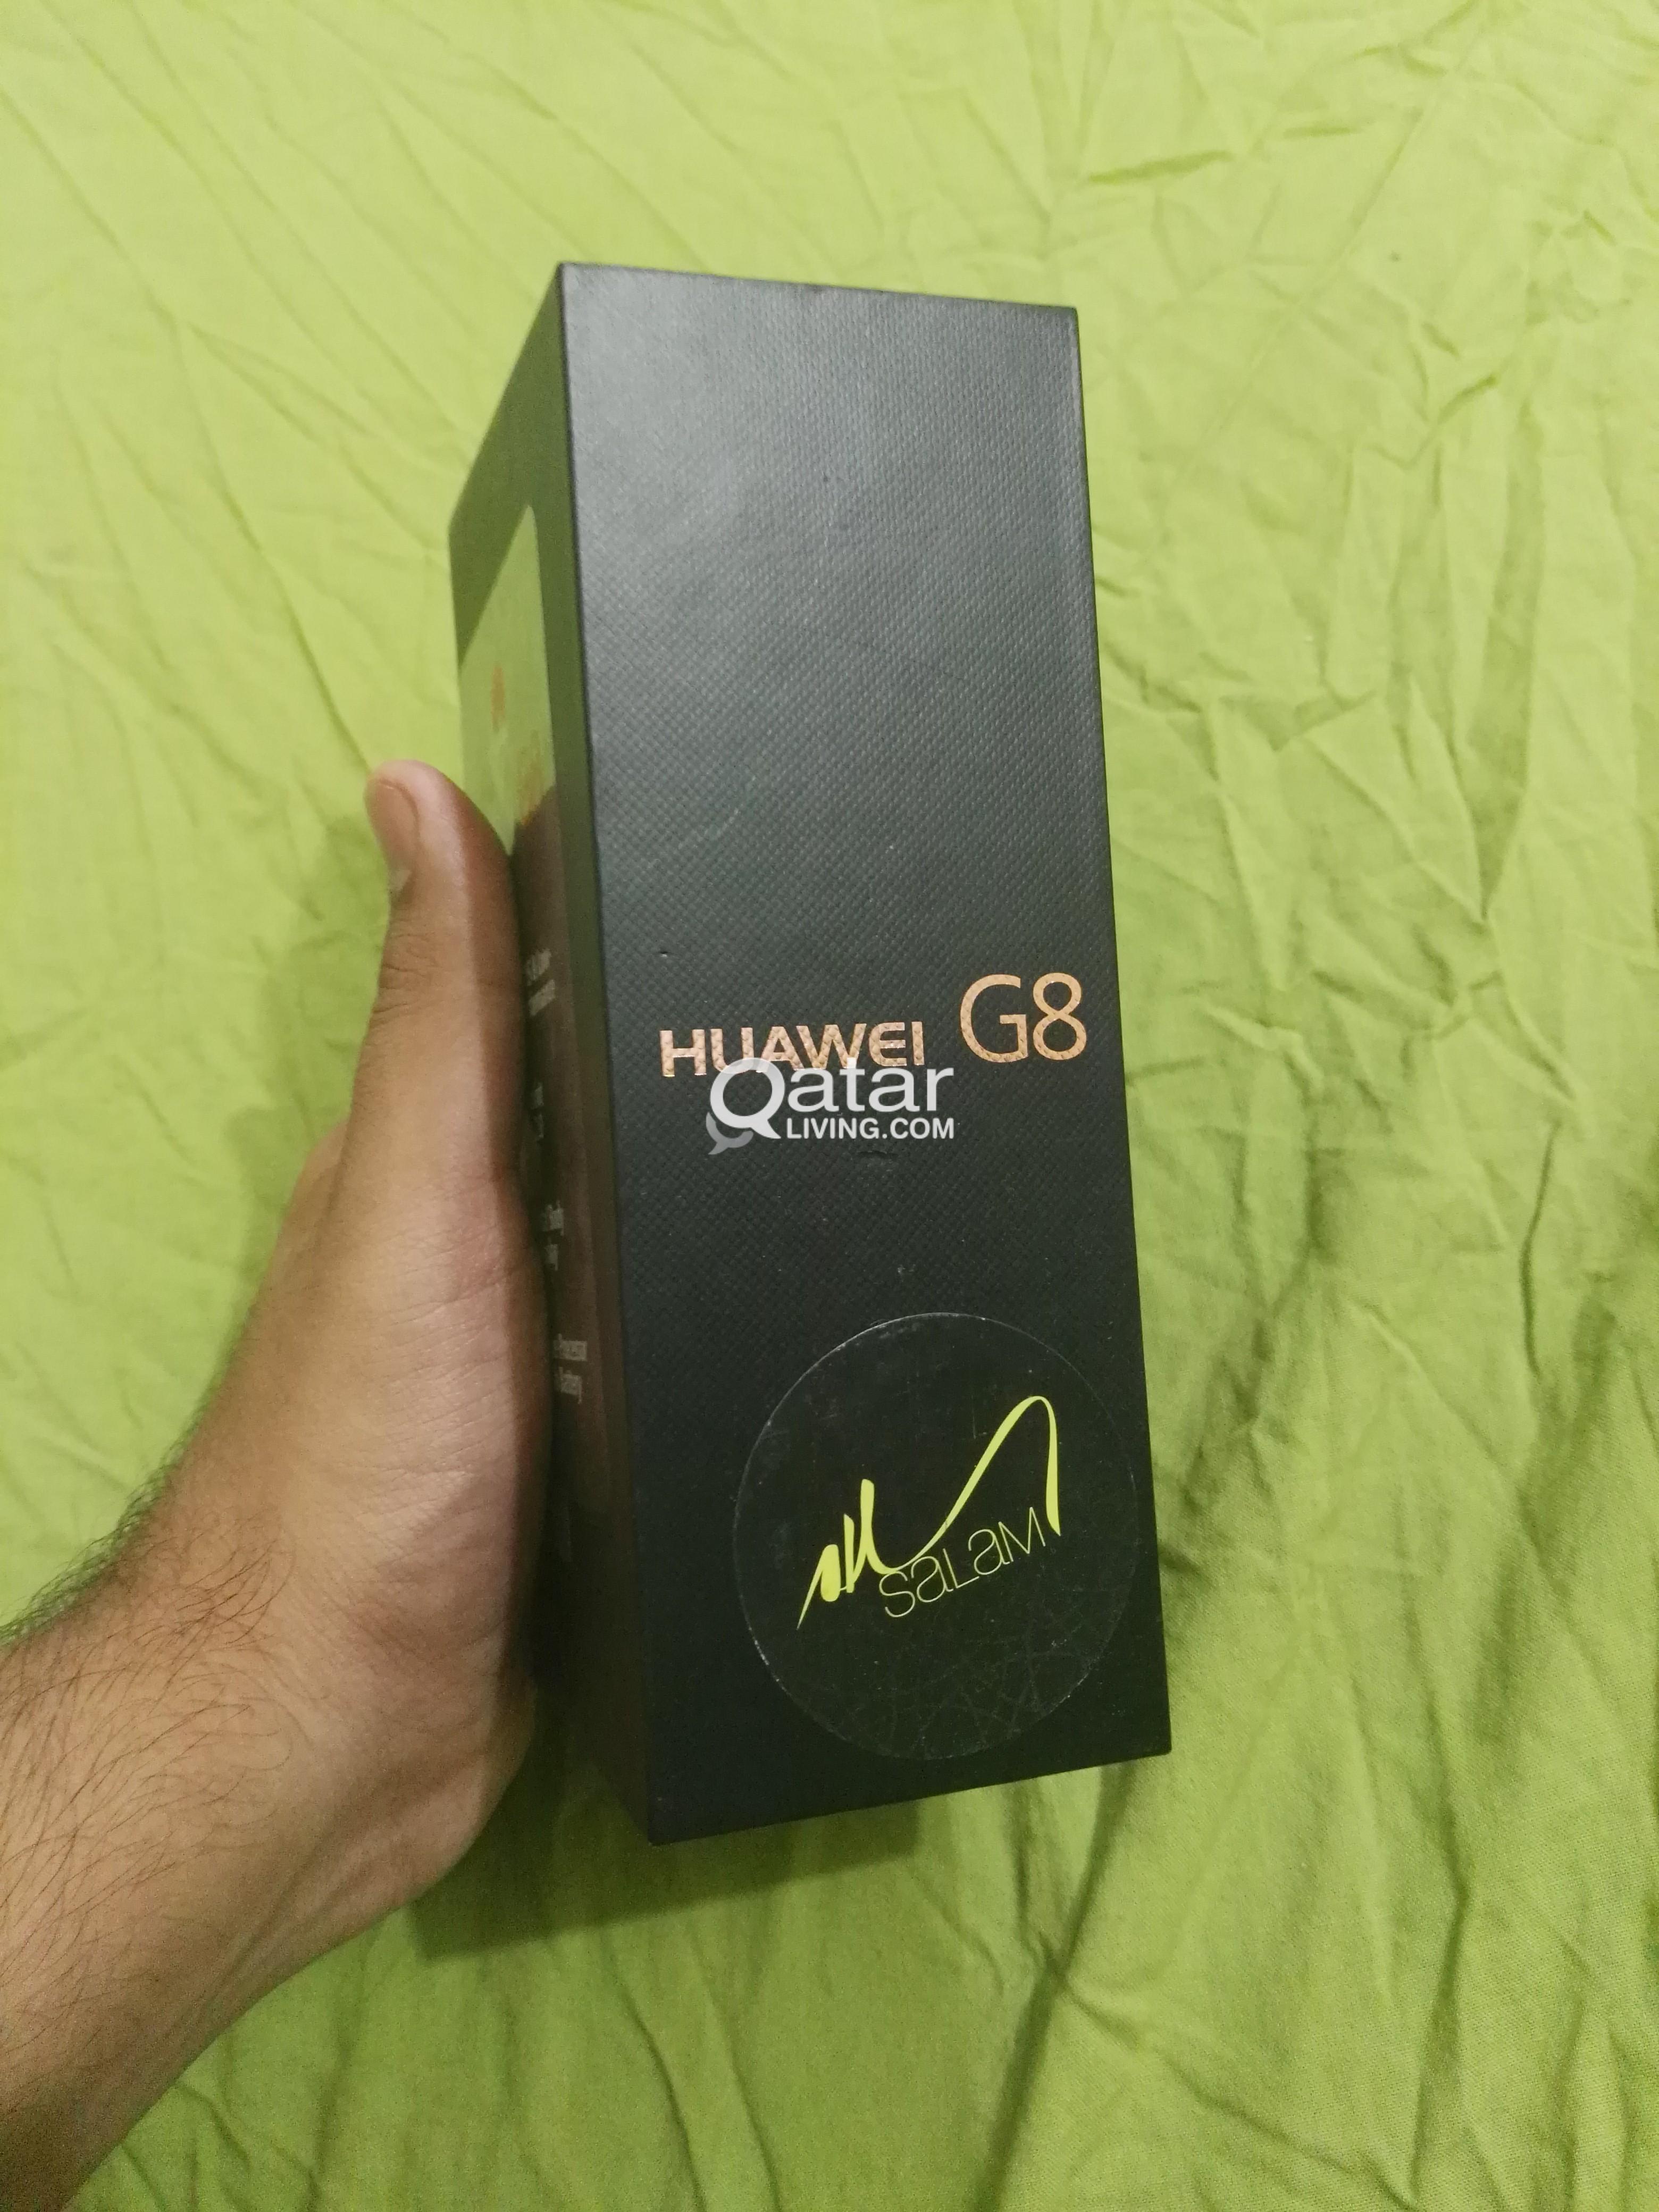 Huawei G8 32 Gb Silver 3 Months Used Qatar Living